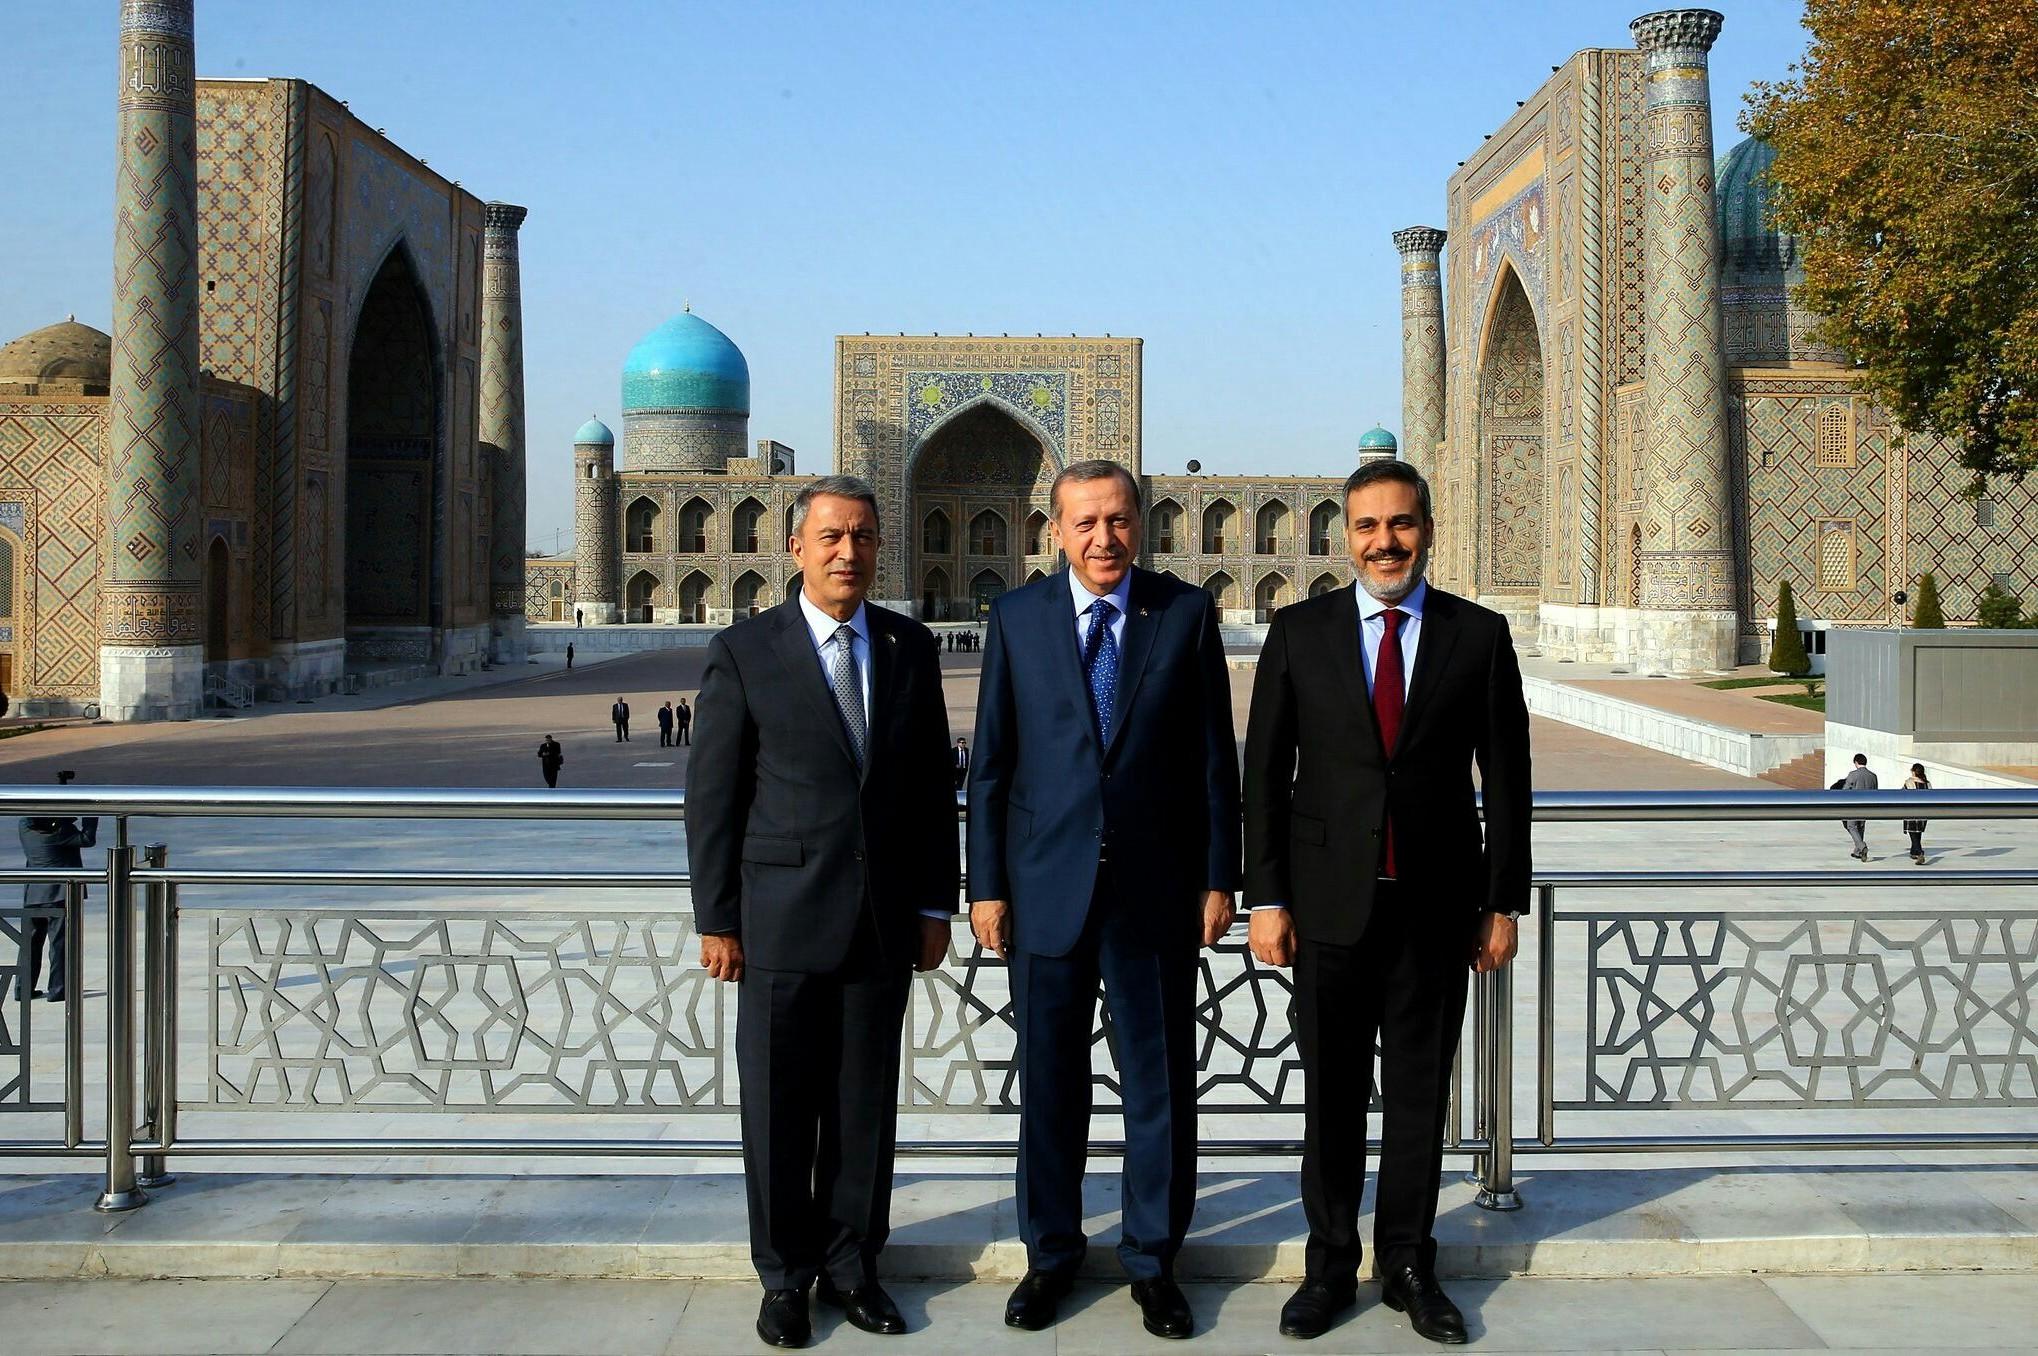 (Sleva nadesno) Turski ministar odbrane Hulusi Akar, turski predsednik Redžep Tajip Erdogan i direktor turske obaveštajne službe Hakan Fidan